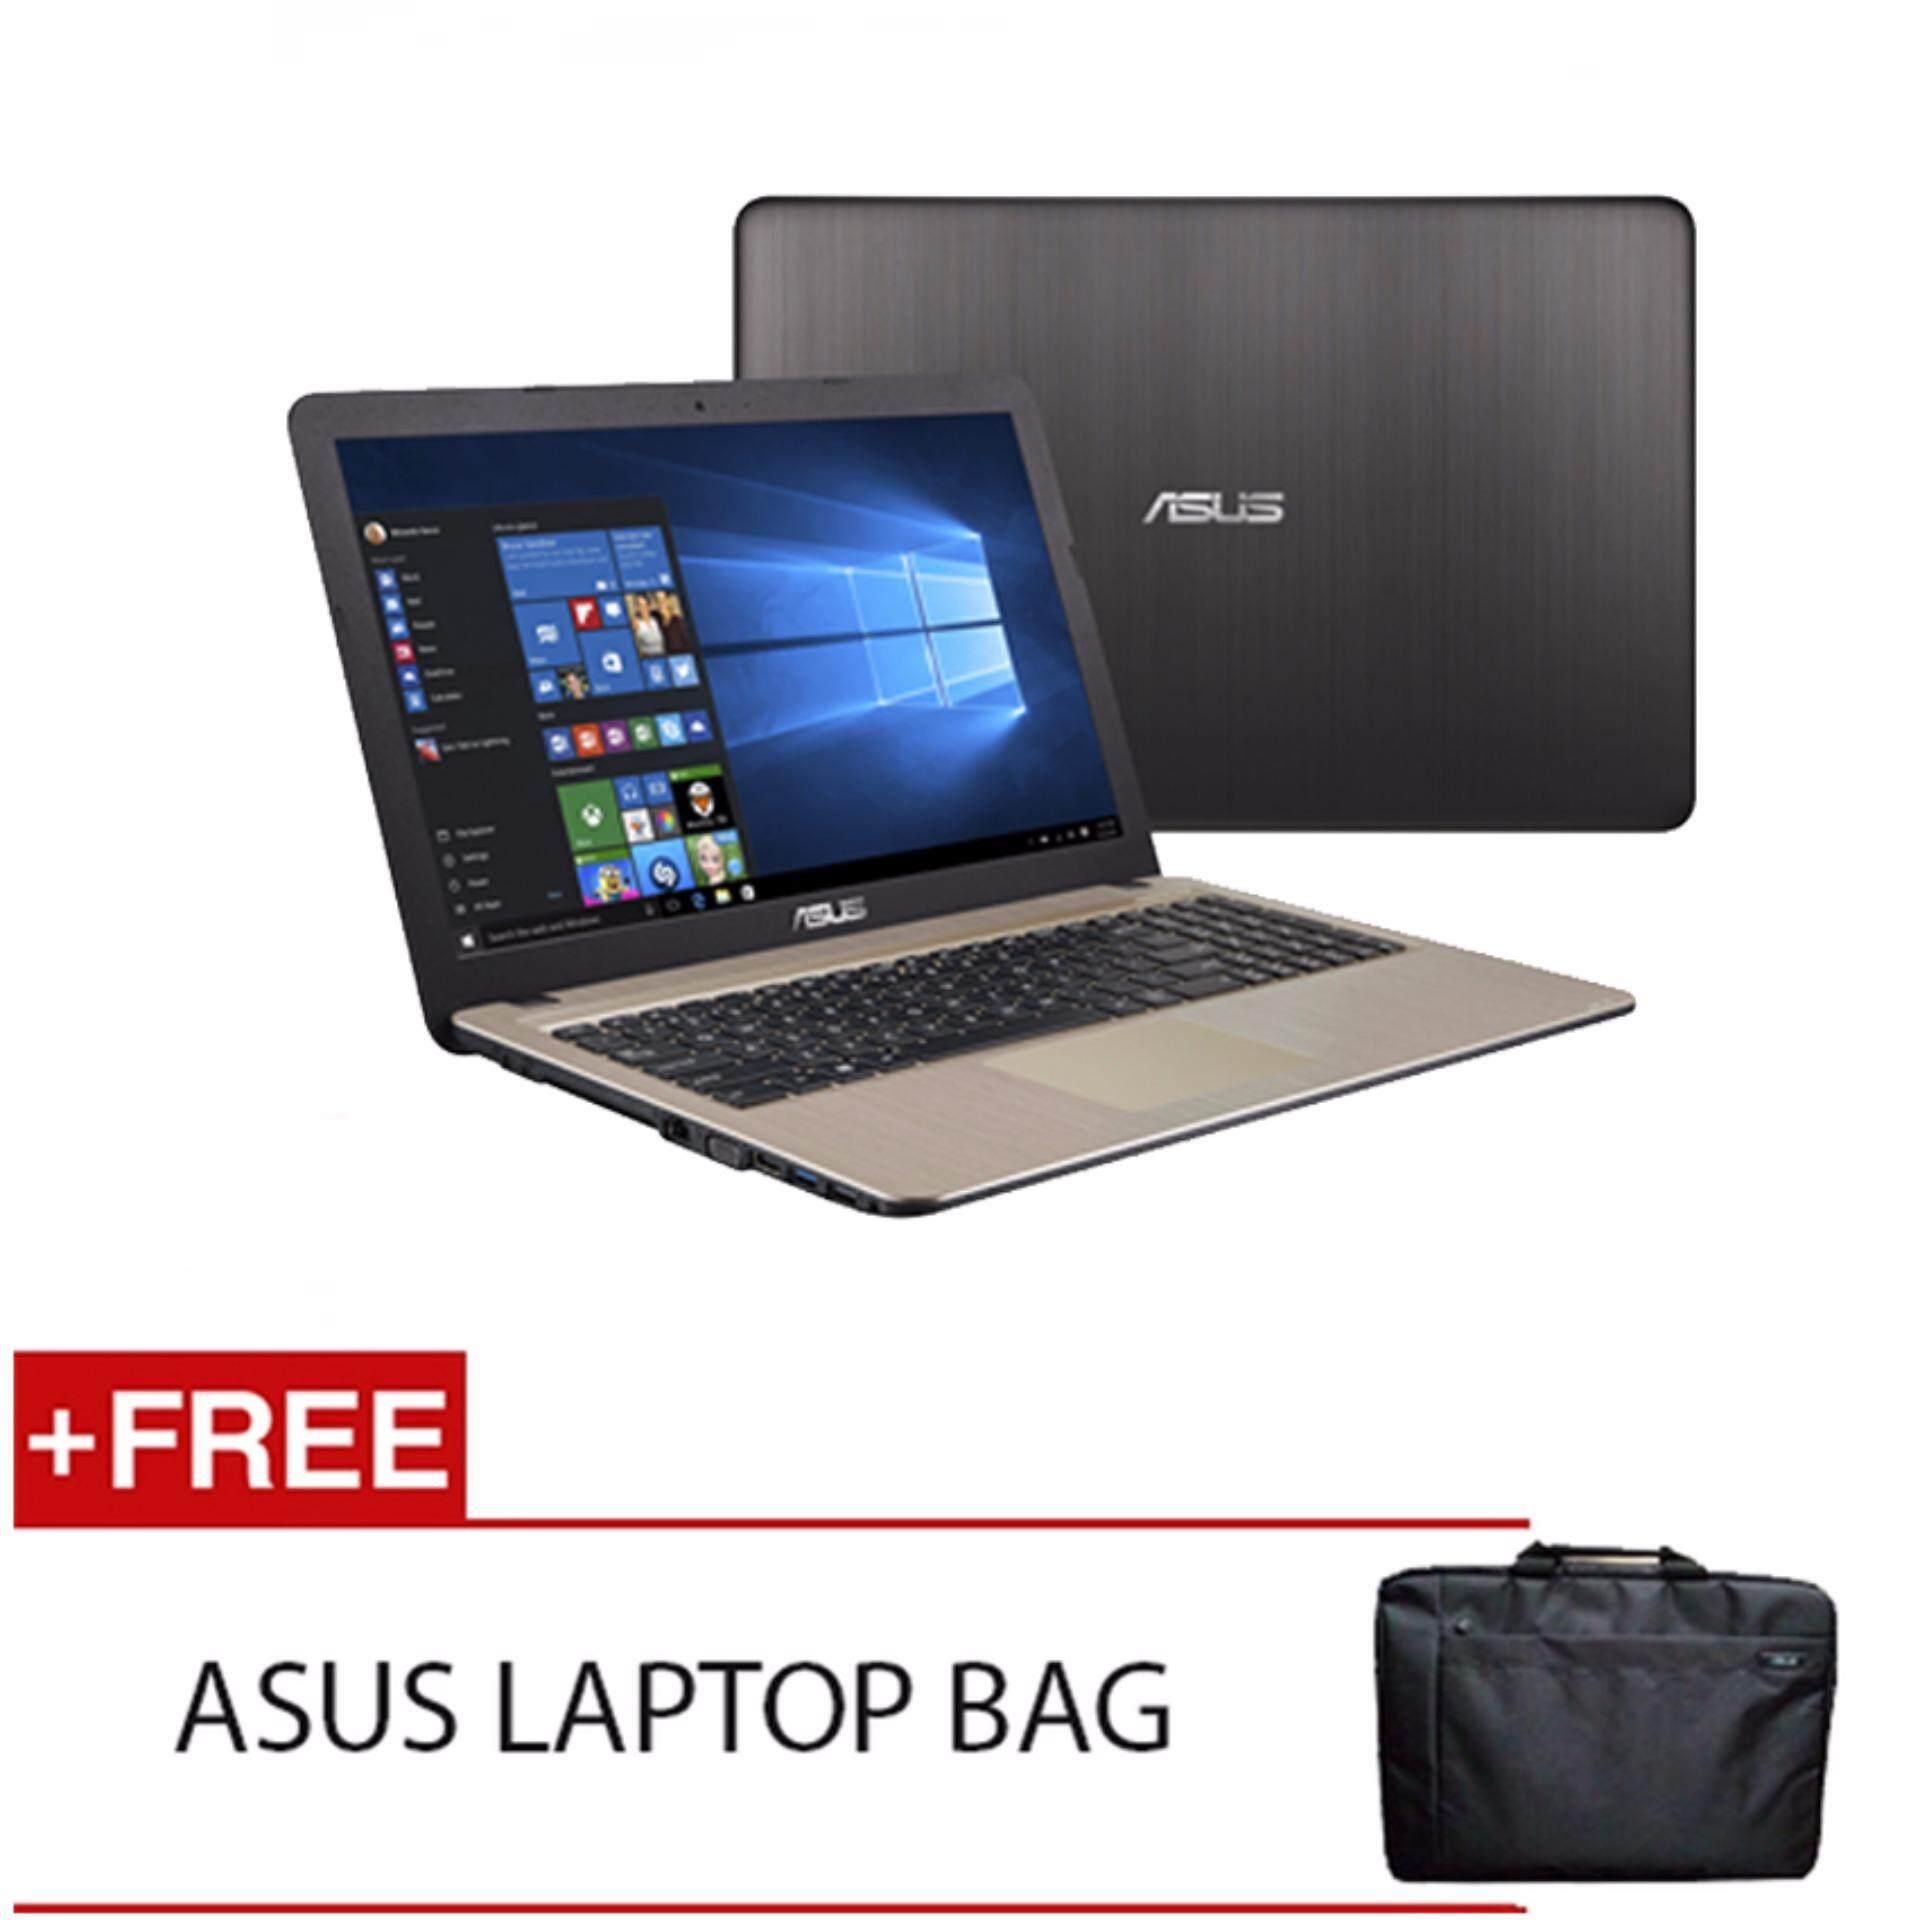 ASUS X541N-AGO280T N3350 4G 500G WIN10 (BLACK) FREE ASUS LAPTOP BAG Malaysia